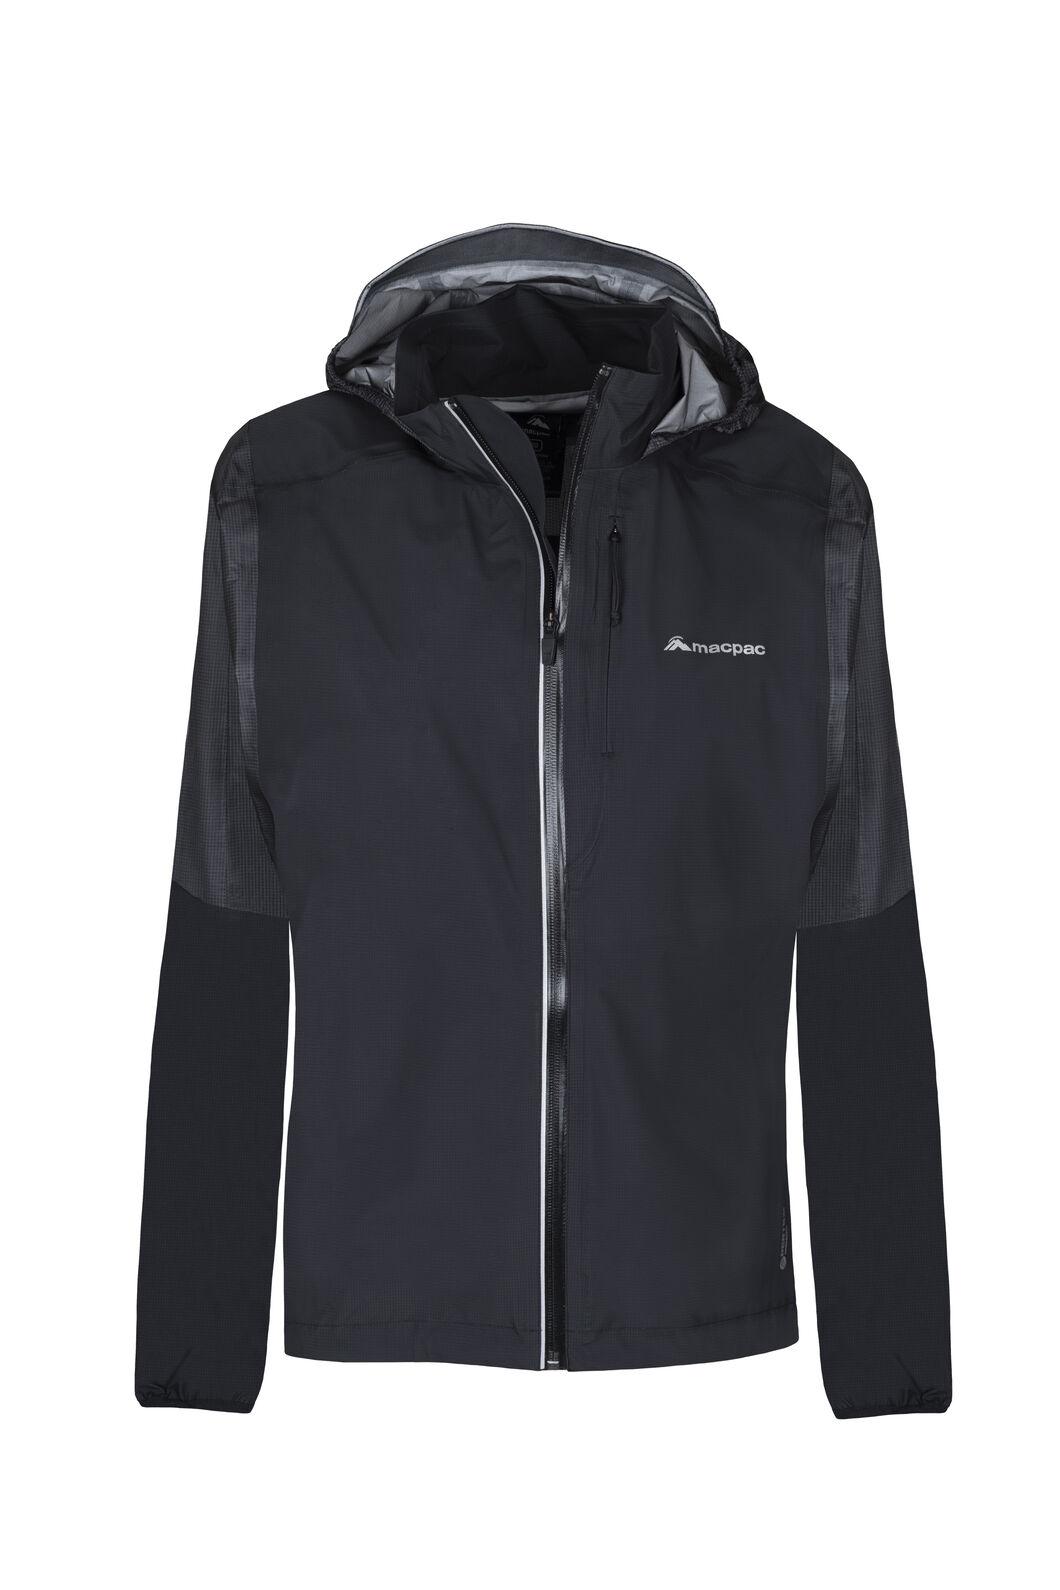 Macpac Transition Pertex® Shield Rain Jacket - Women's, Black, hi-res